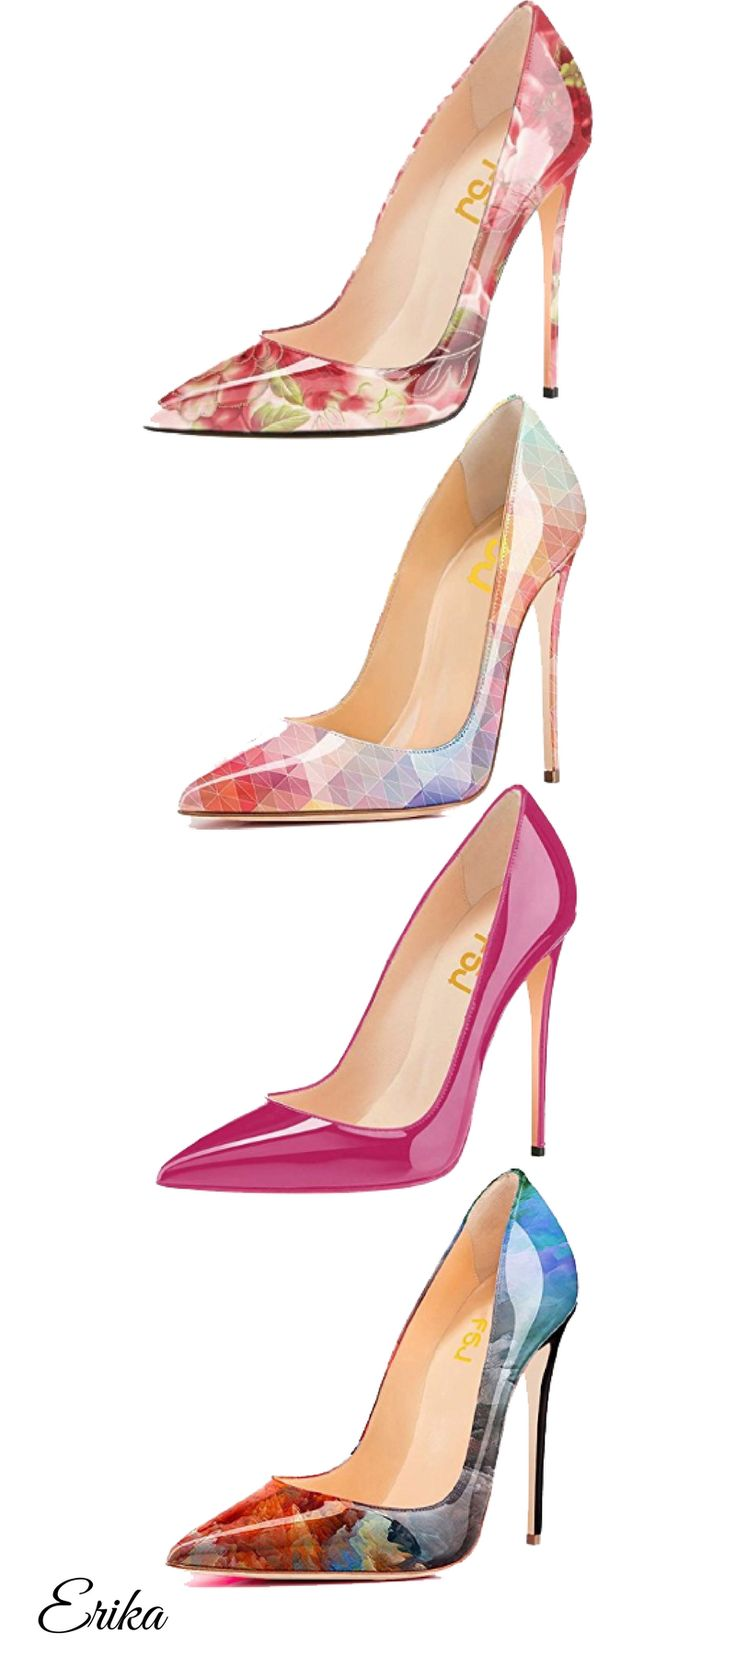 FSJ Women Fashion Pointed Toe Pumps High Heel Stilettos Sexy Slip On Dress Shoes